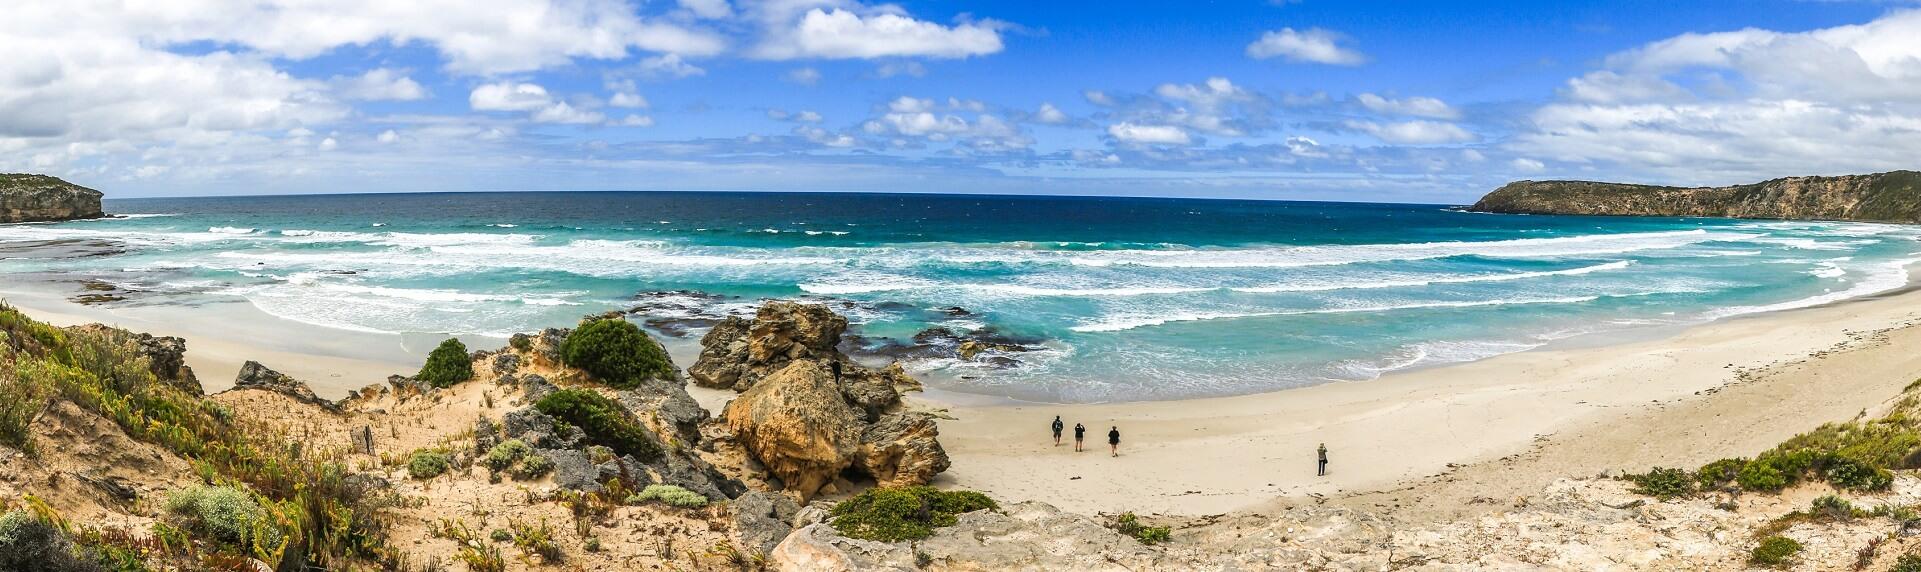 2-day-kangaroo-island-tour